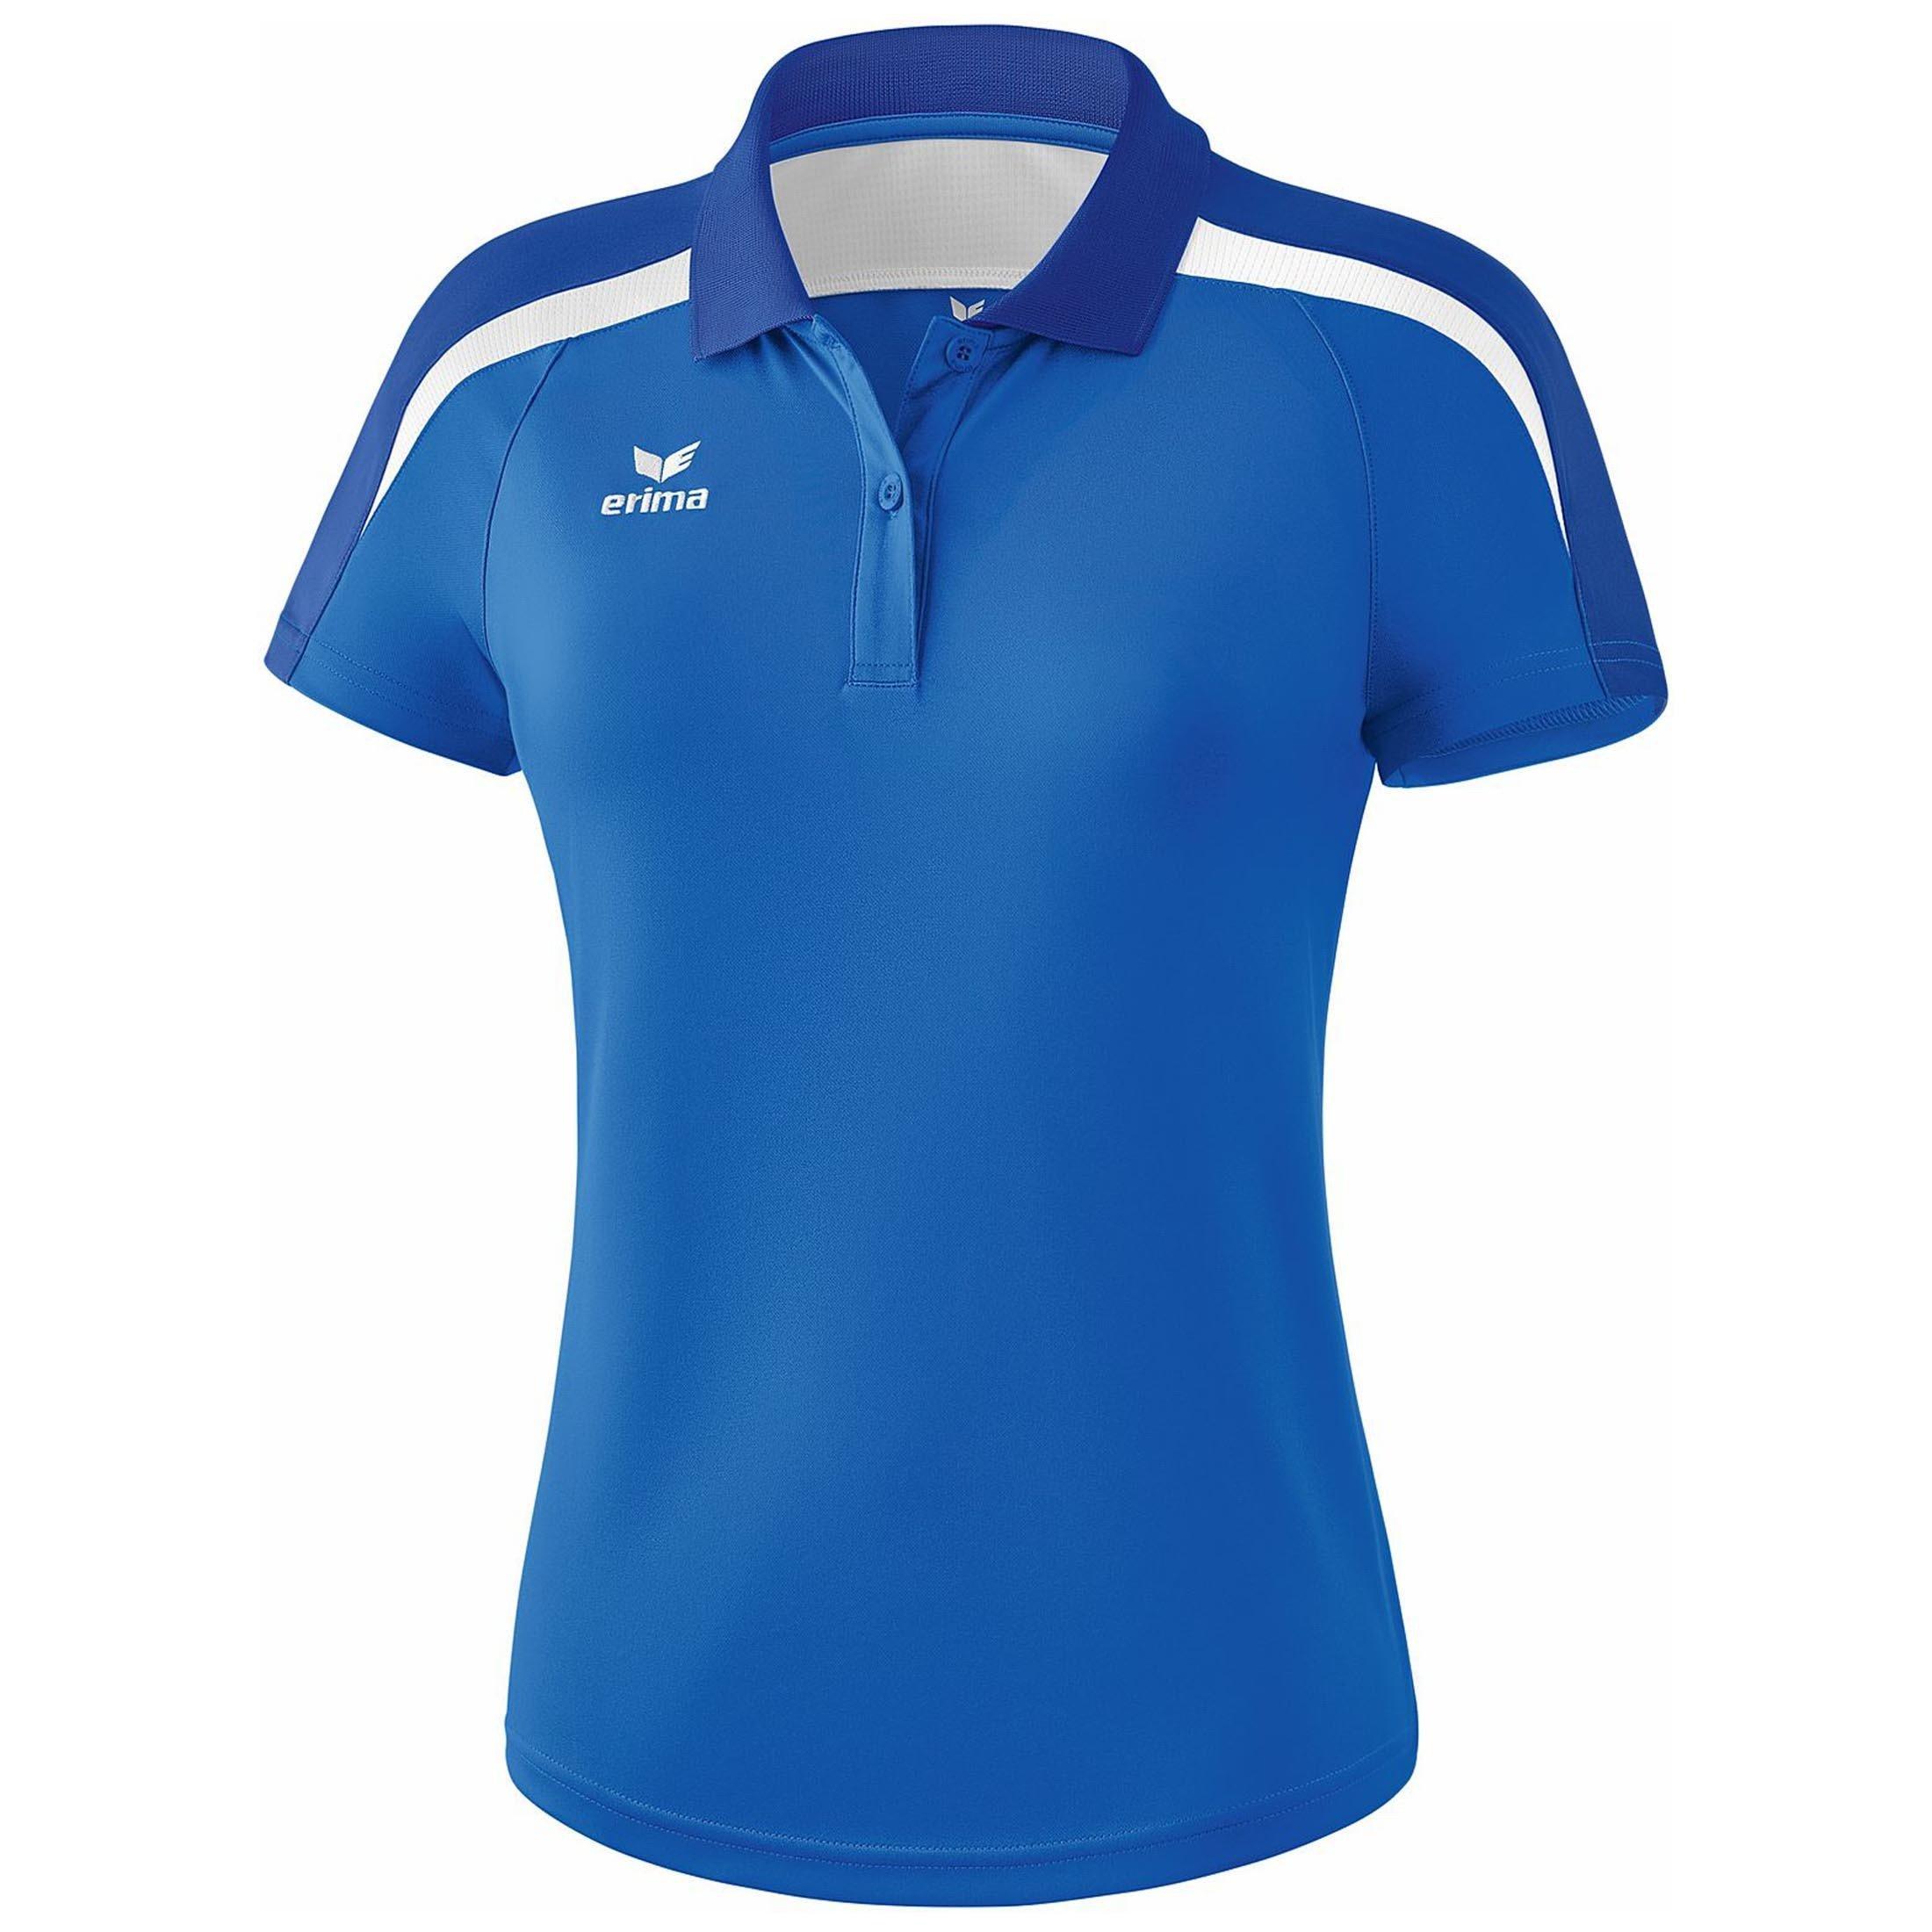 Erima Liga 20 Poloshirt Damen